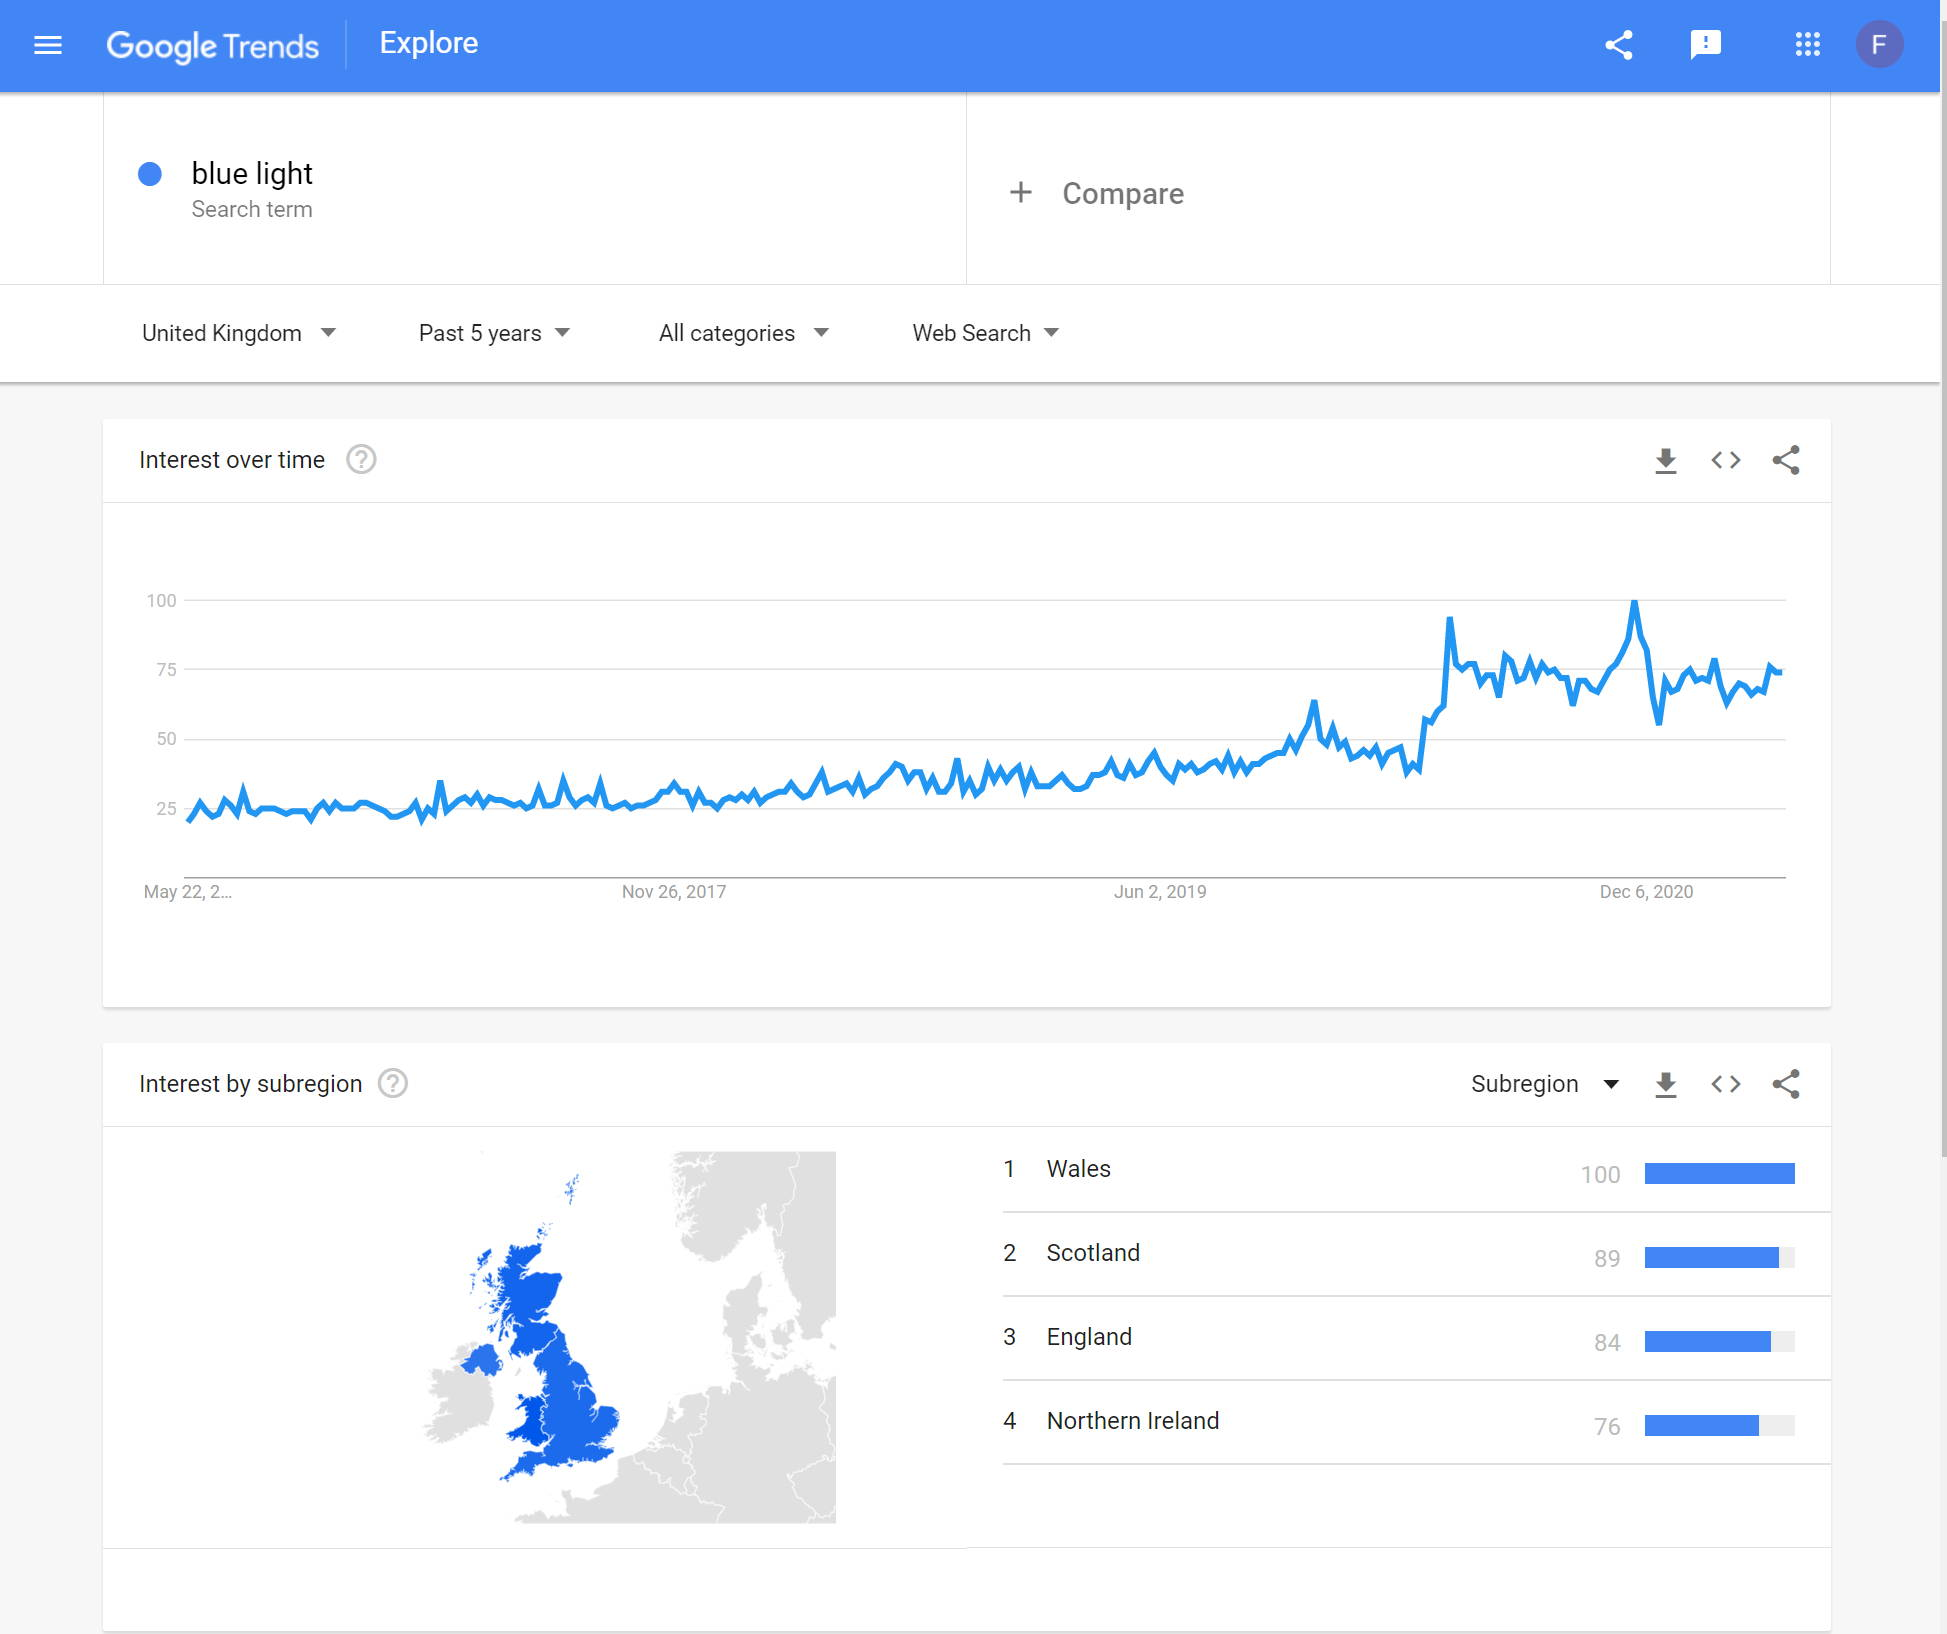 Blue Light - Google Trends